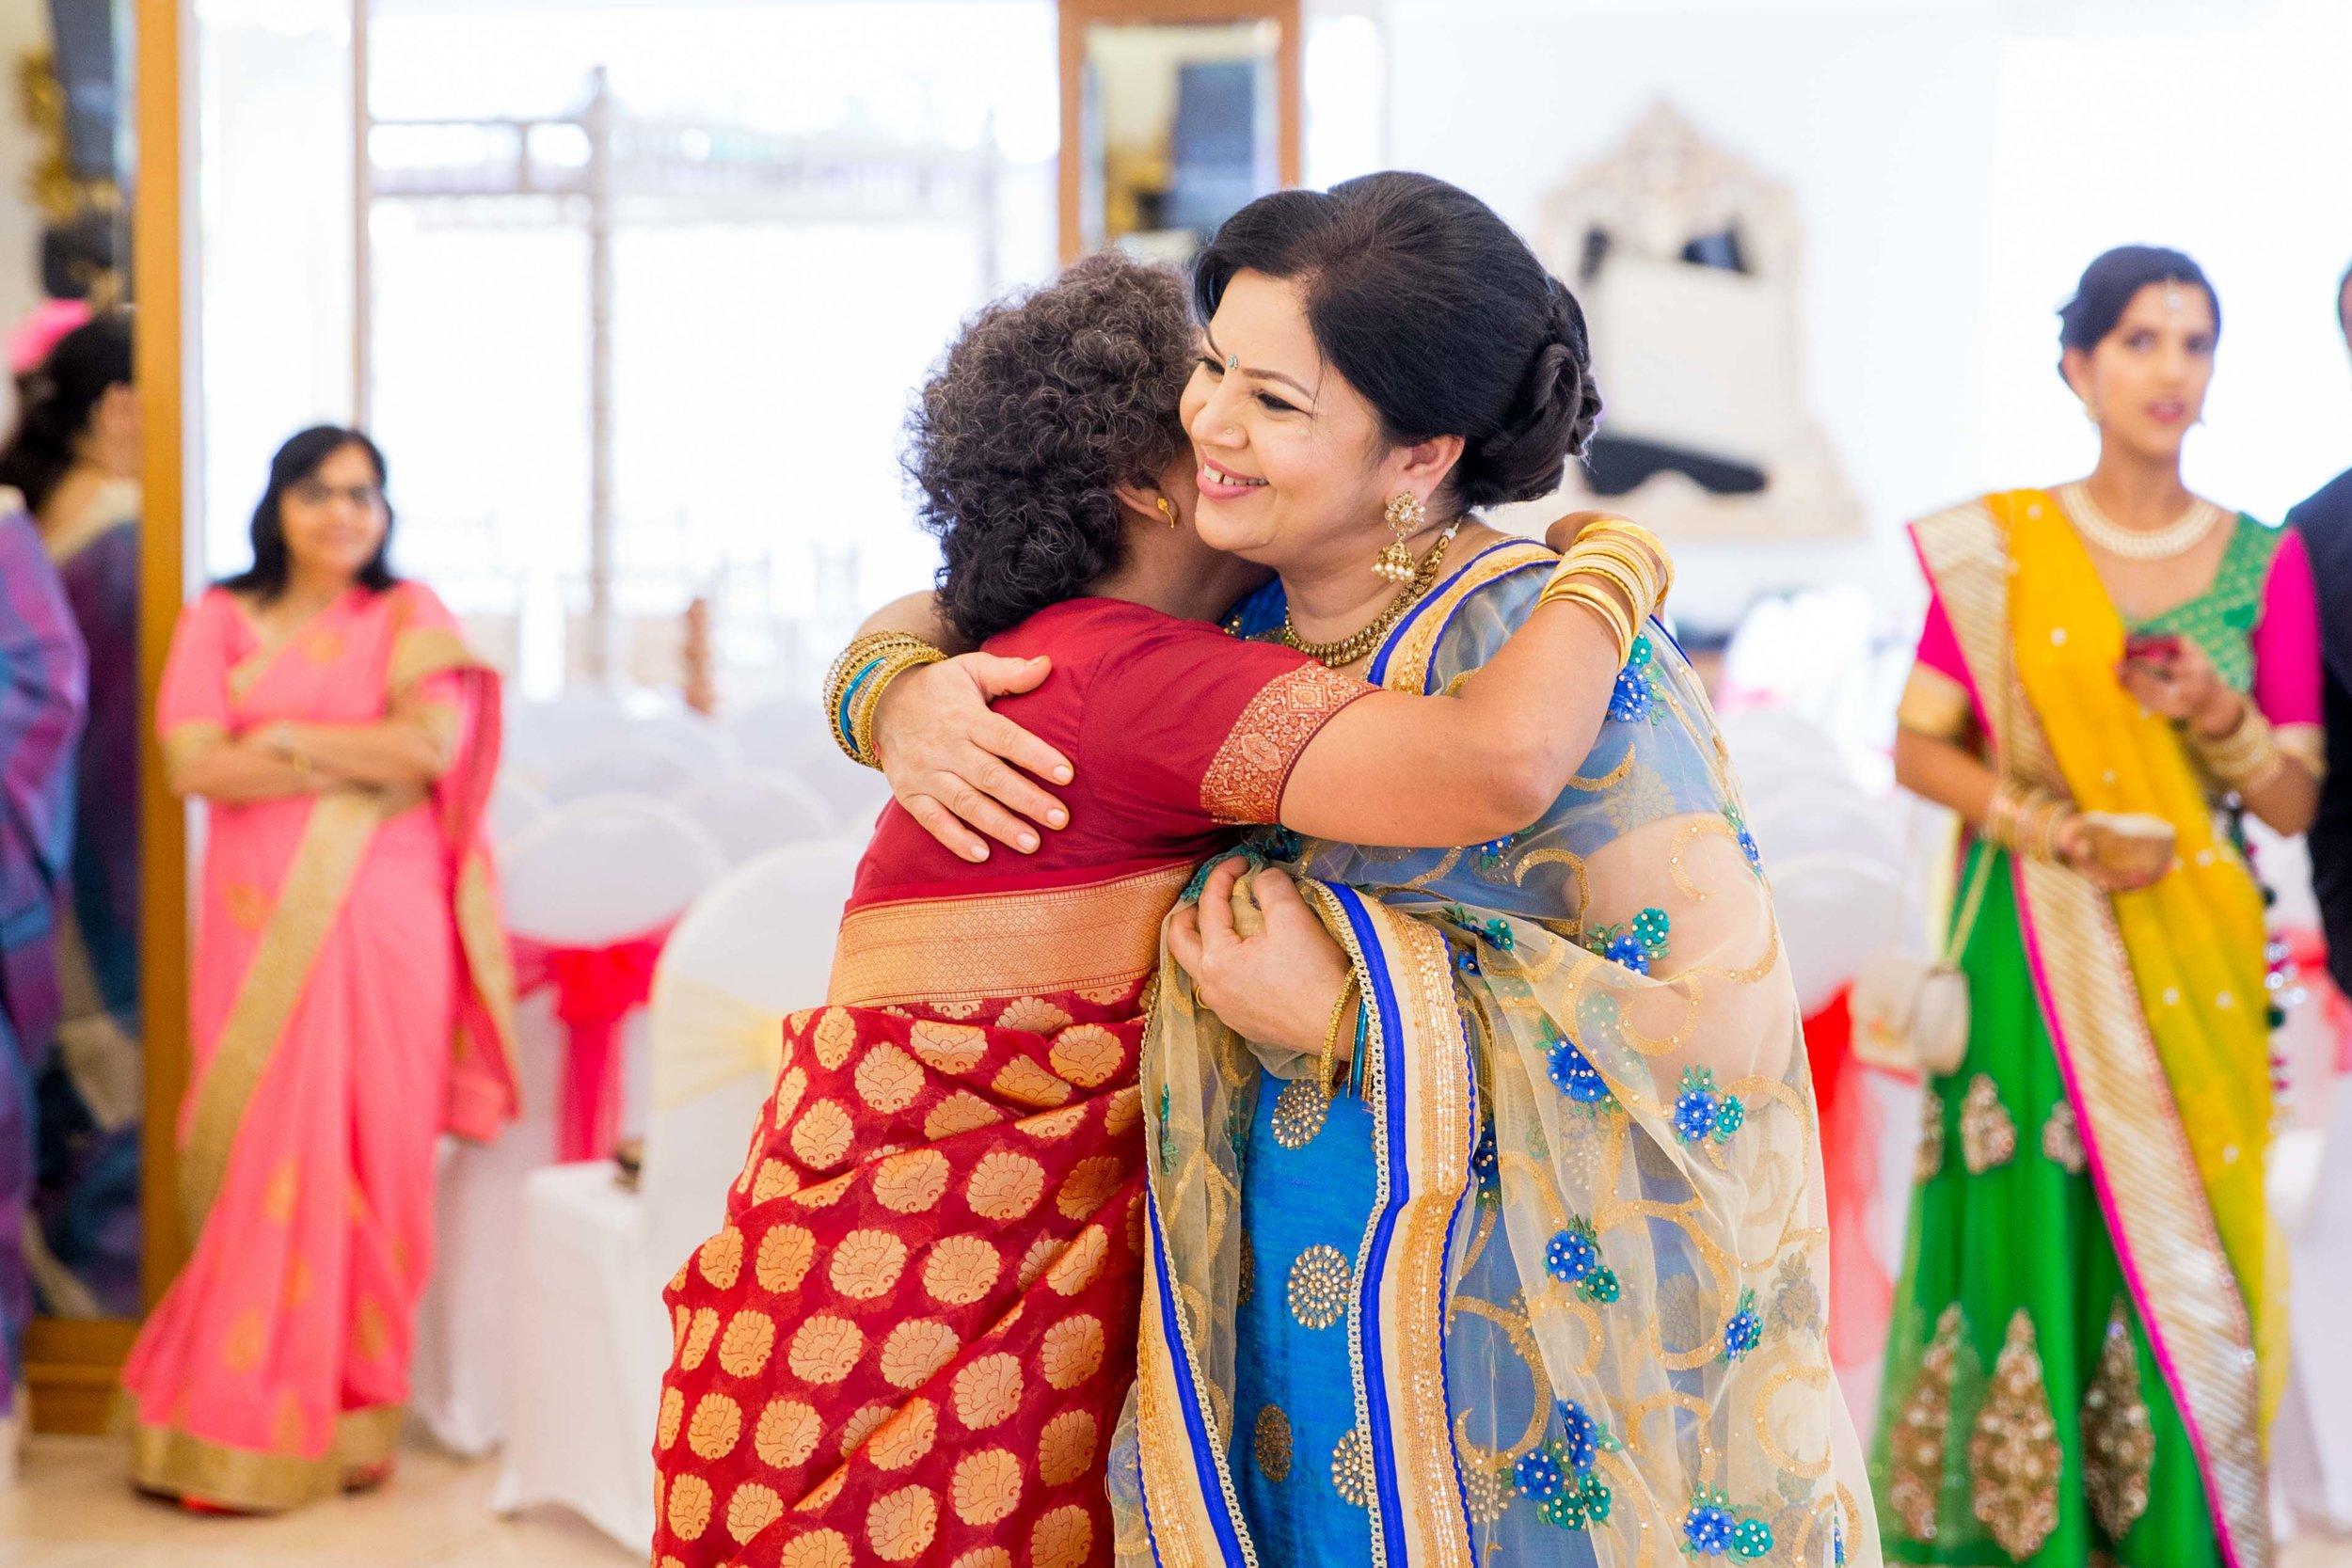 ramada-park-hall-hotel-birmingham-wolverhampton-hindu-wedding-asian-wedding-photography-natalia-smith-photography-16.jpg